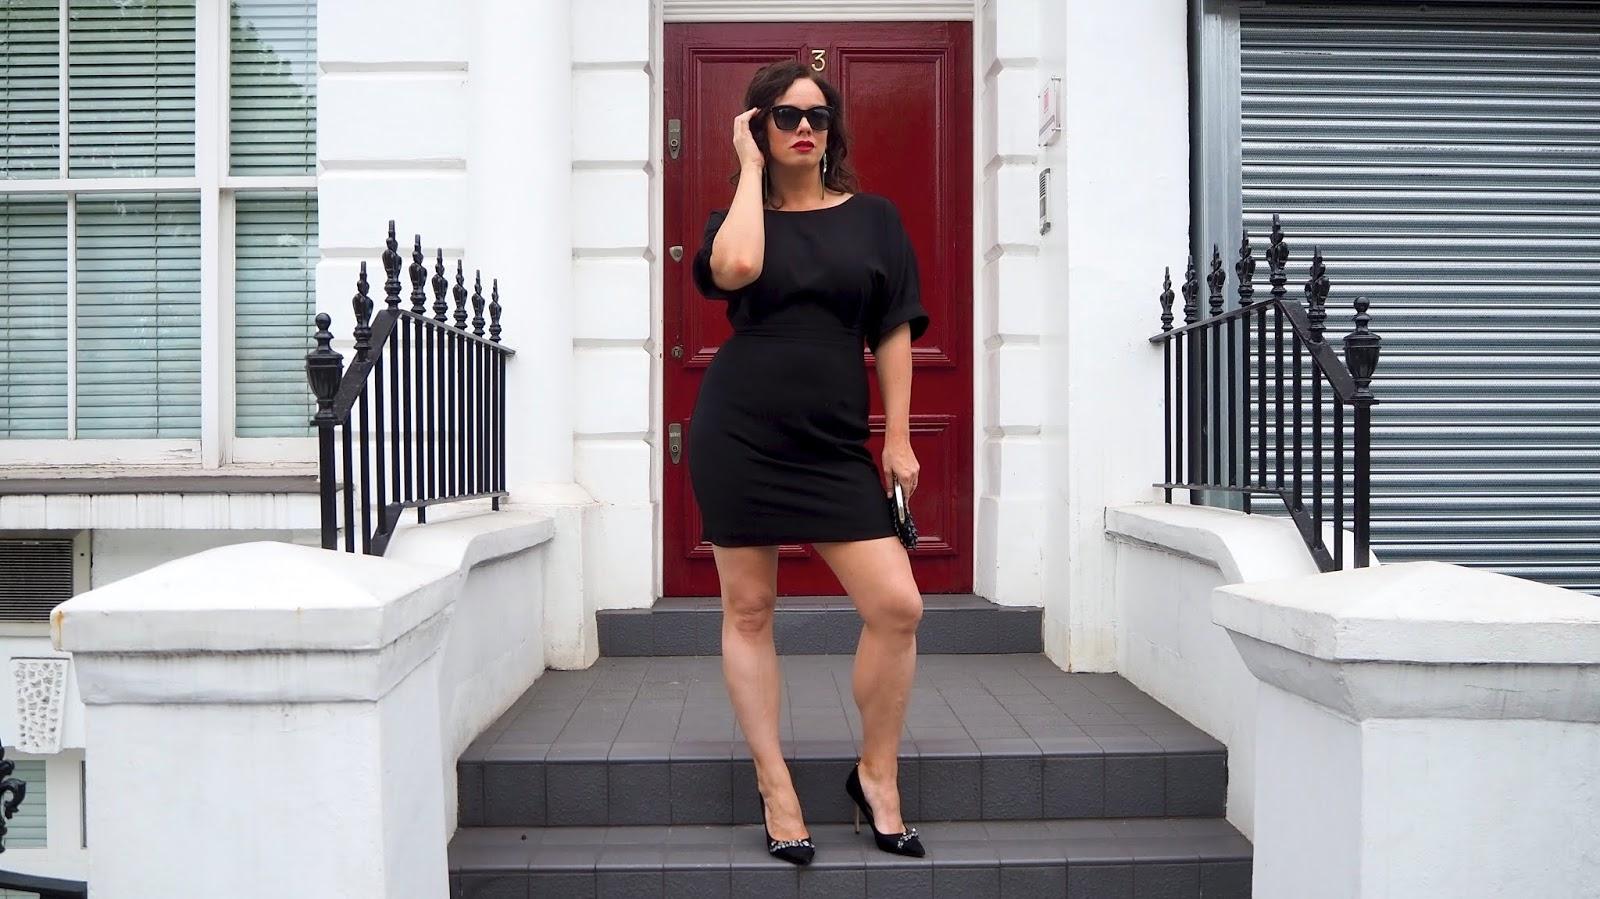 ASOS BLACK DRESS, Black heels and beaded black clutch